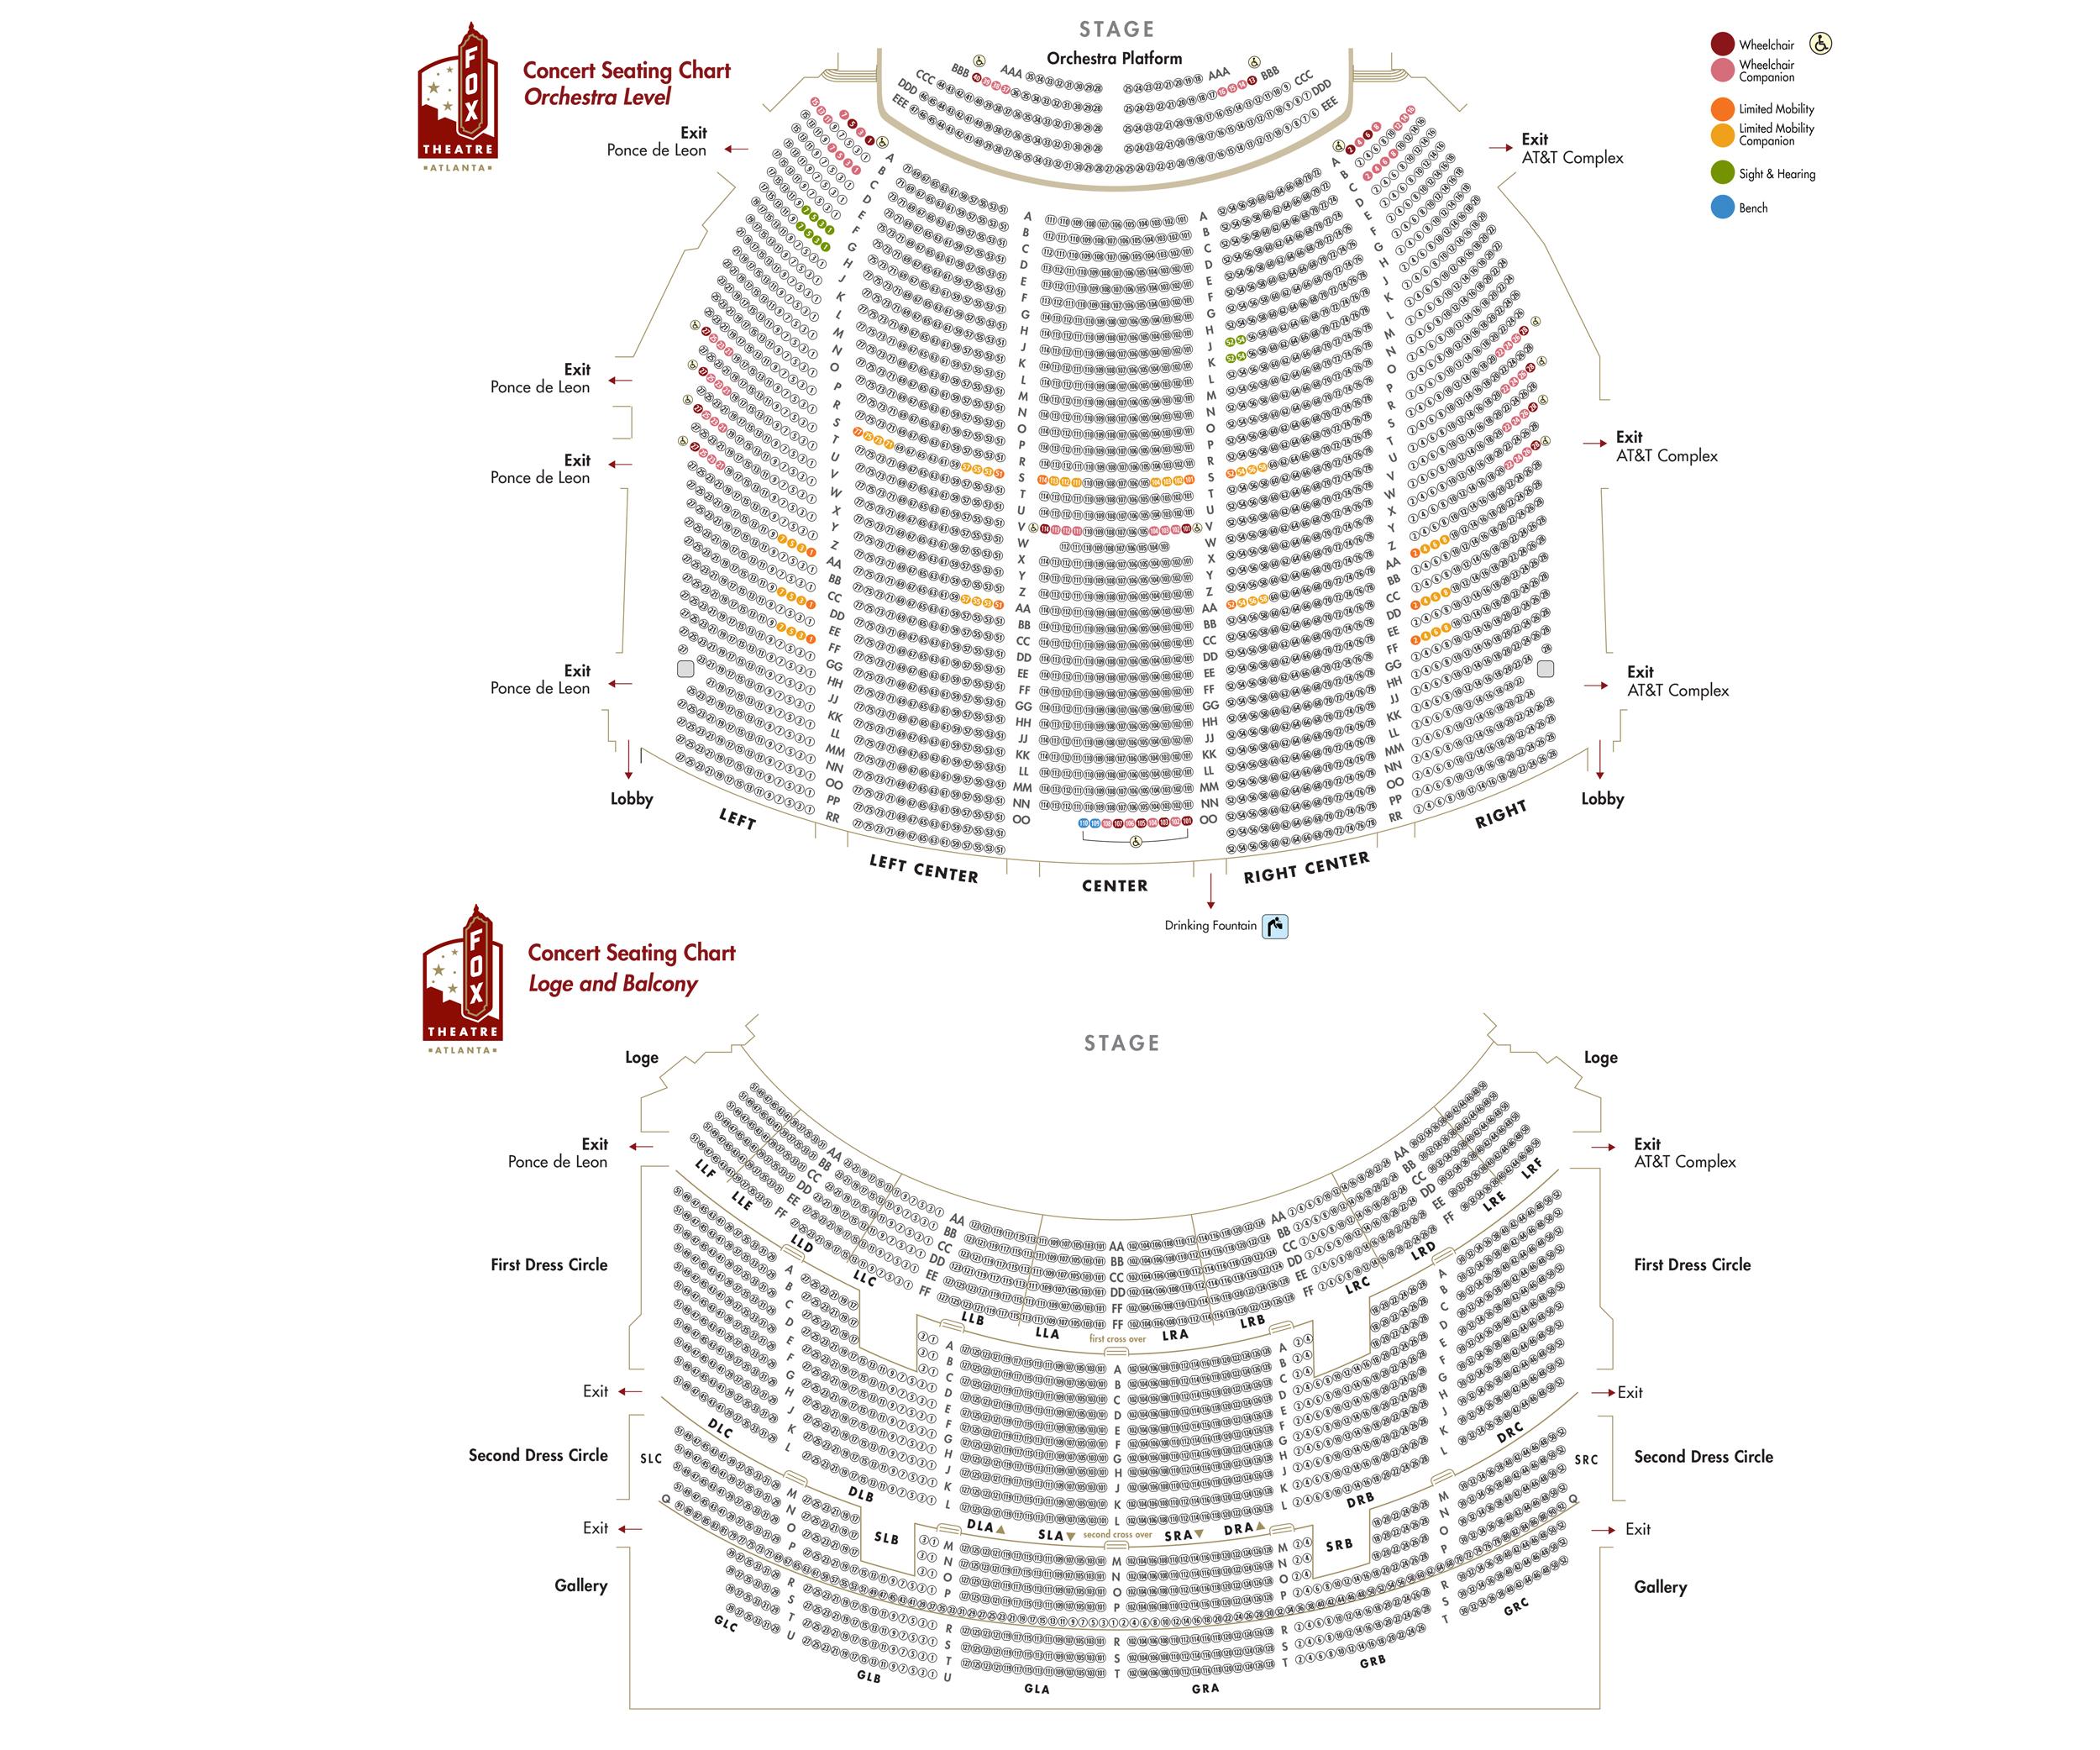 fox theatre atlanta ga tickets schedule seating charts goldstar rh goldstar com fox theater detailed seating chart atlanta fox theater seating chart with seat numbers atlanta